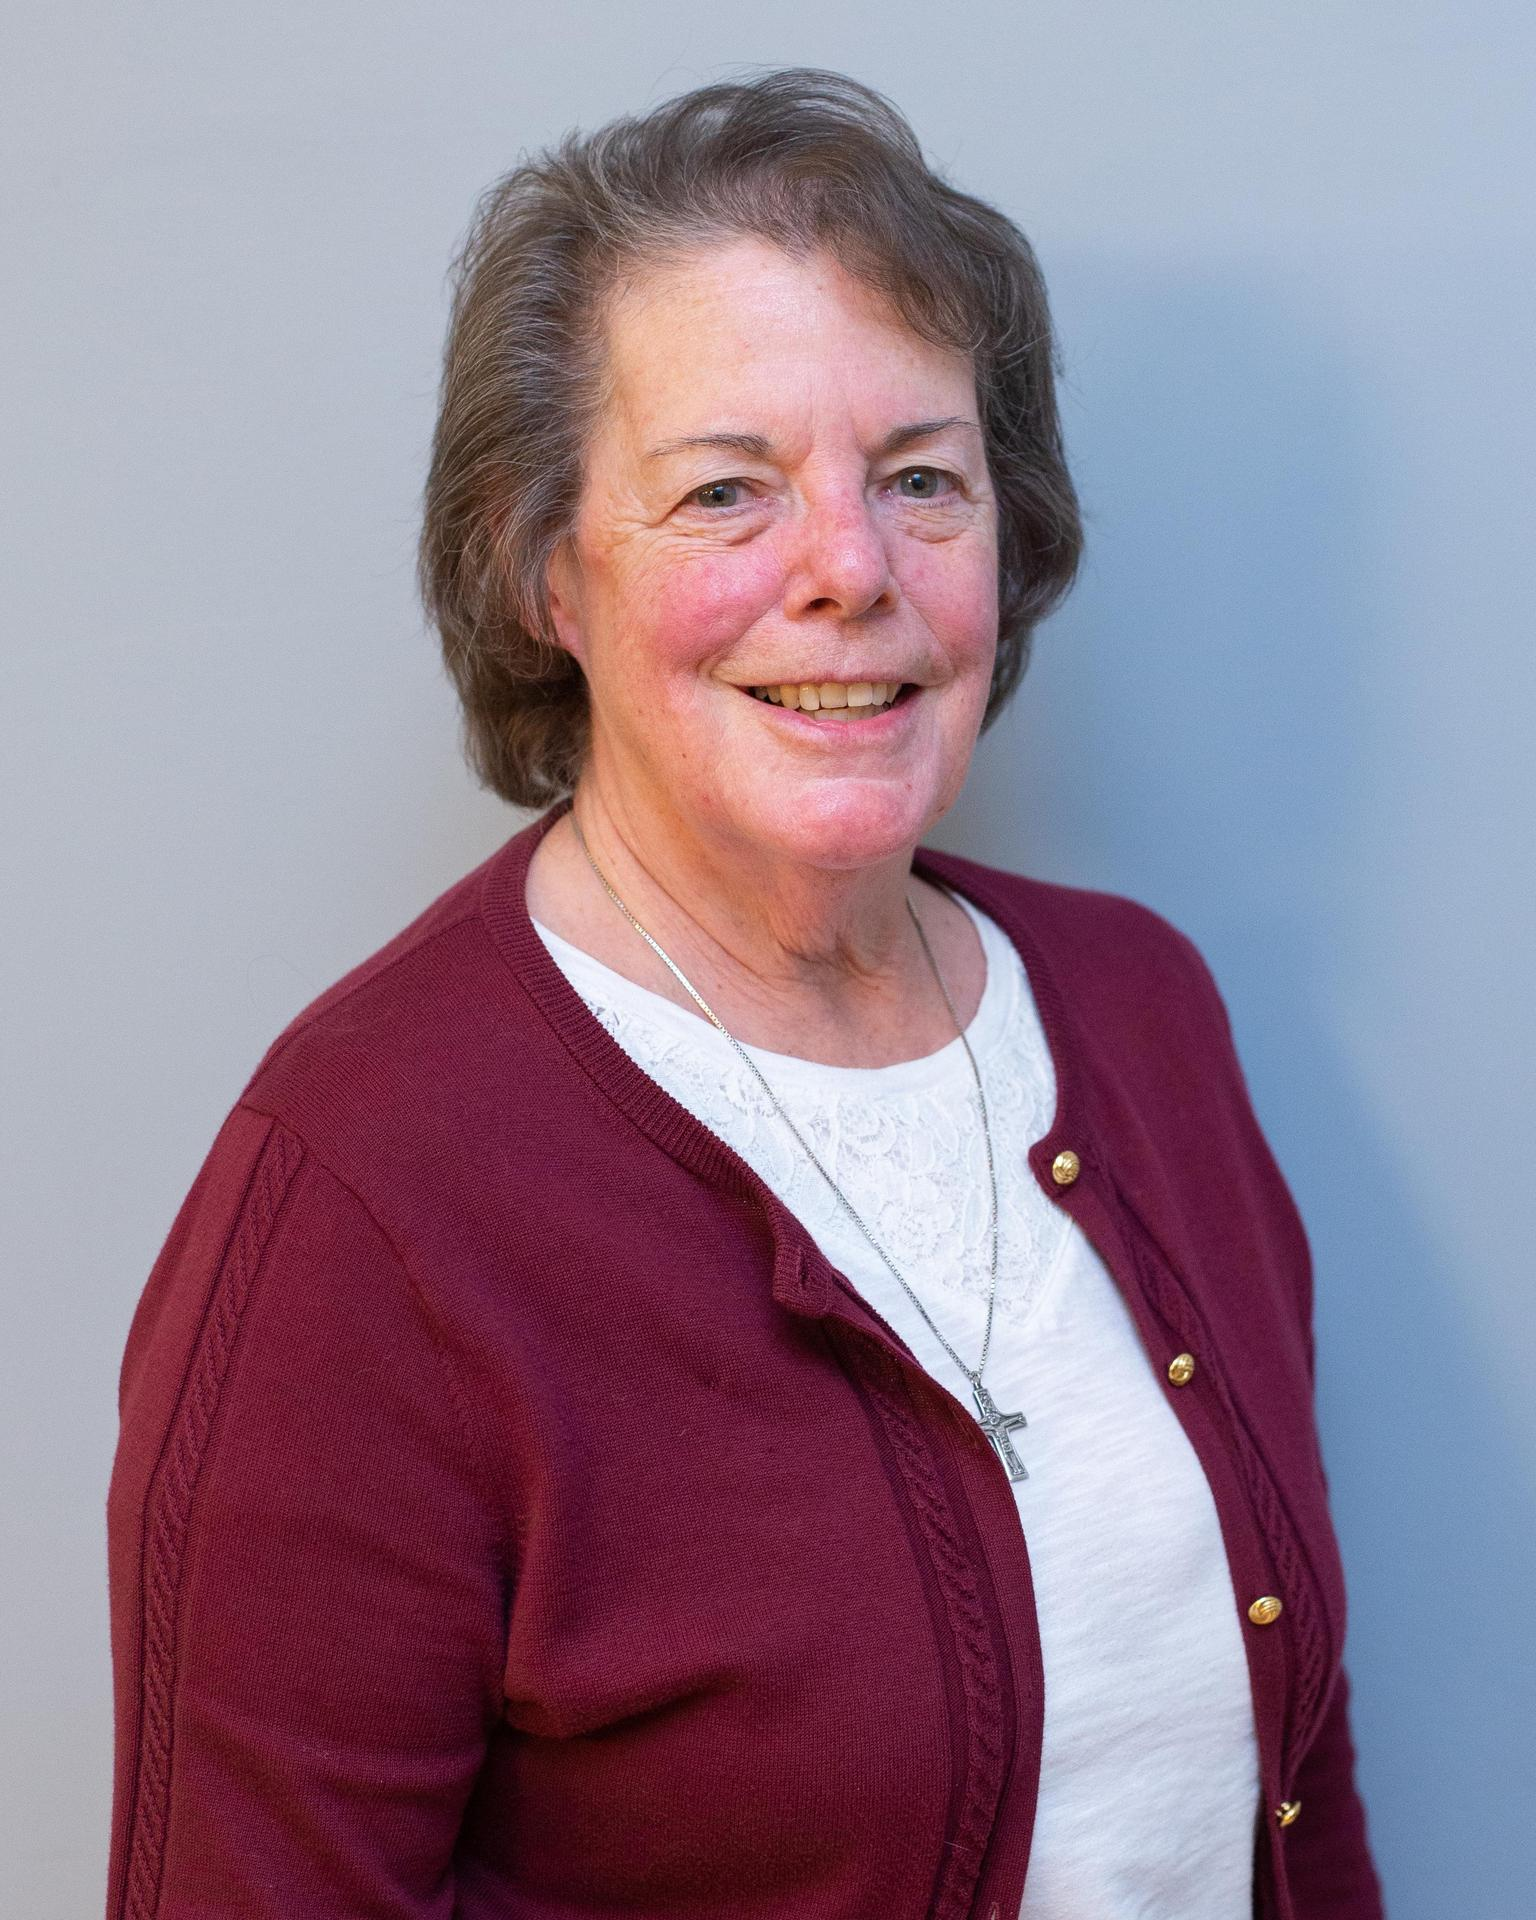 Sr. Gina Marie Blunck